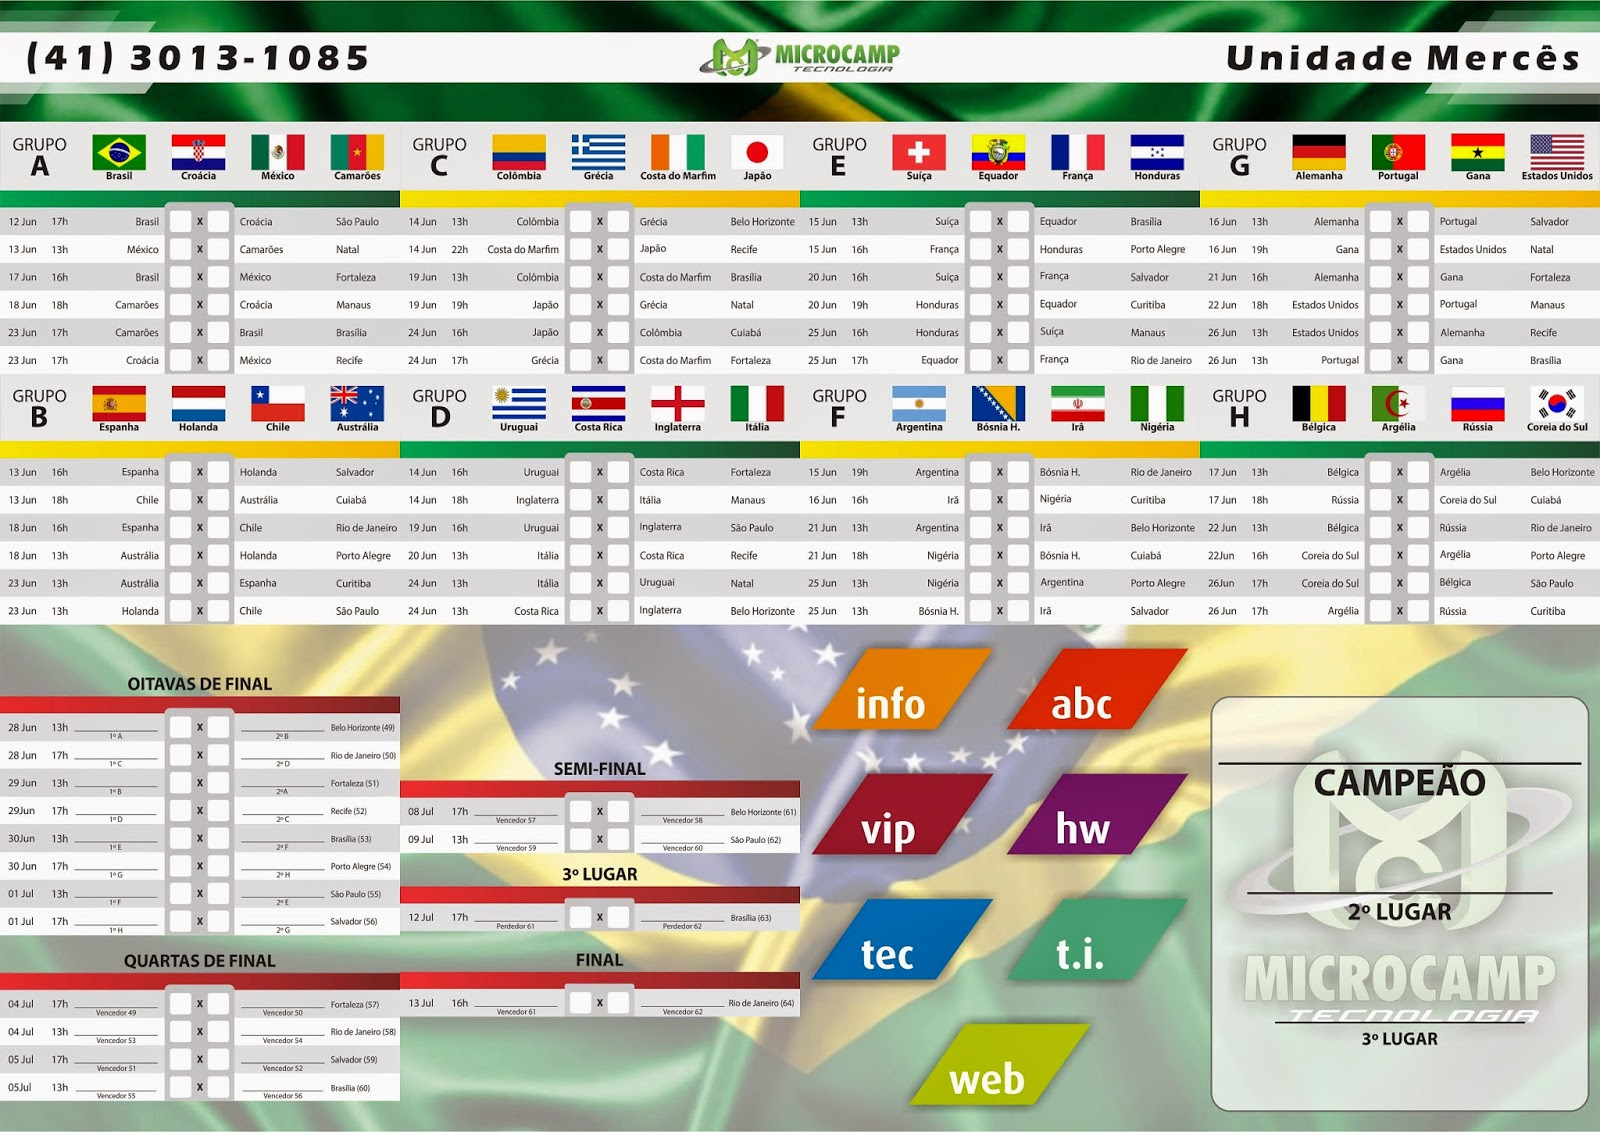 tabela copa do mundo 2014 microcamp